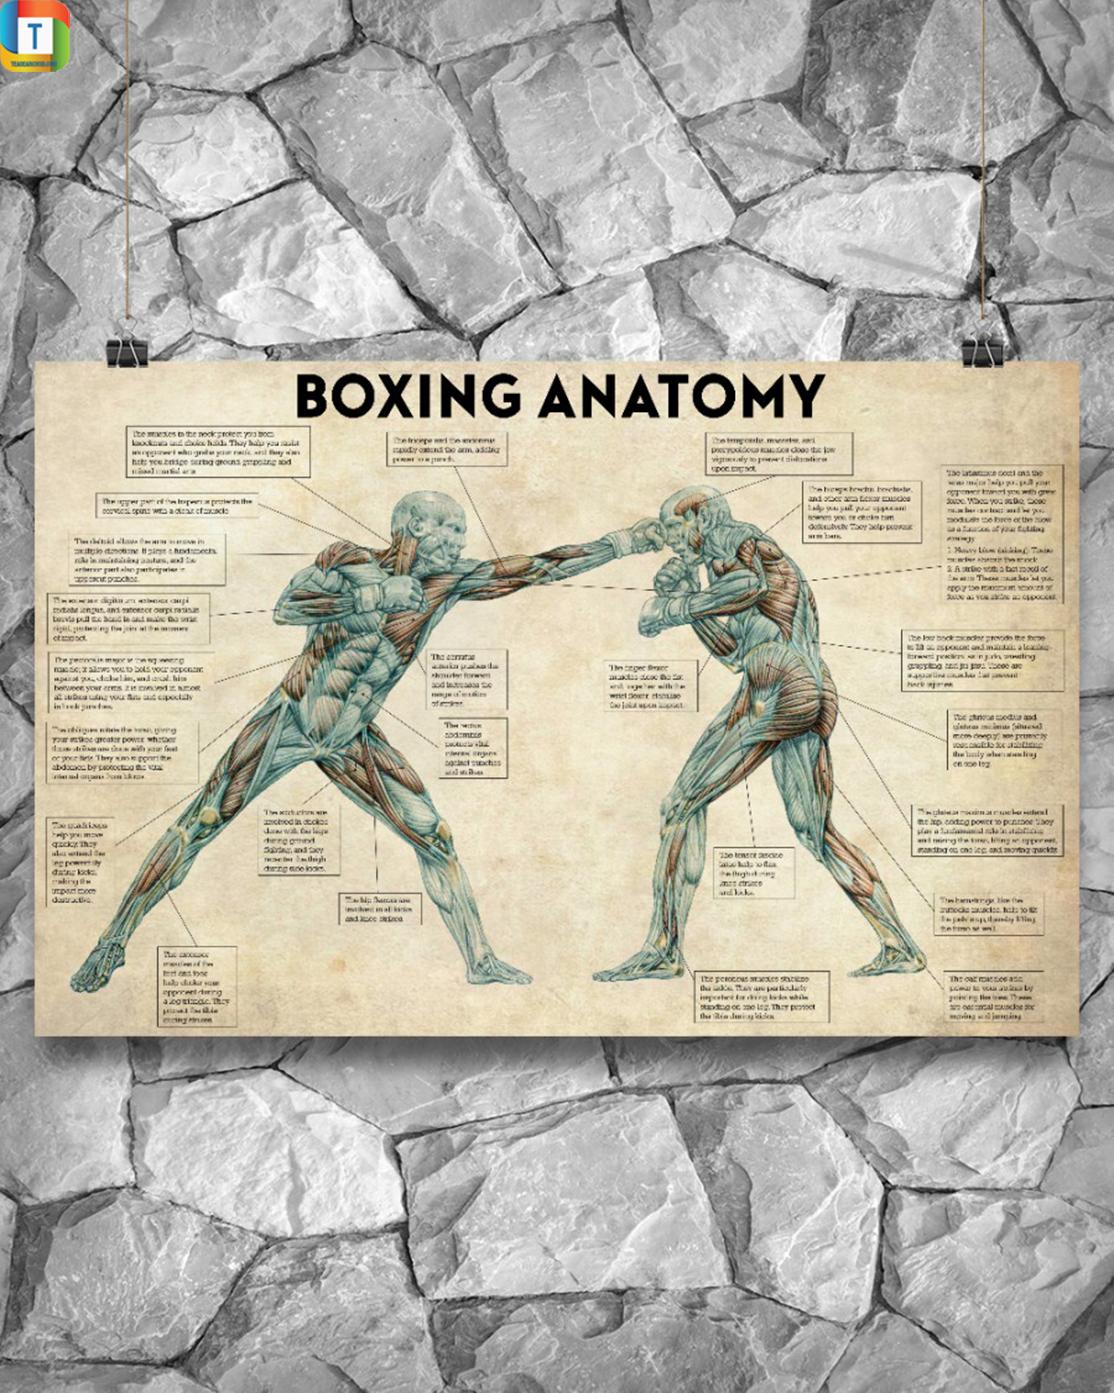 Boxing Anatomy Horizontal Poster 1